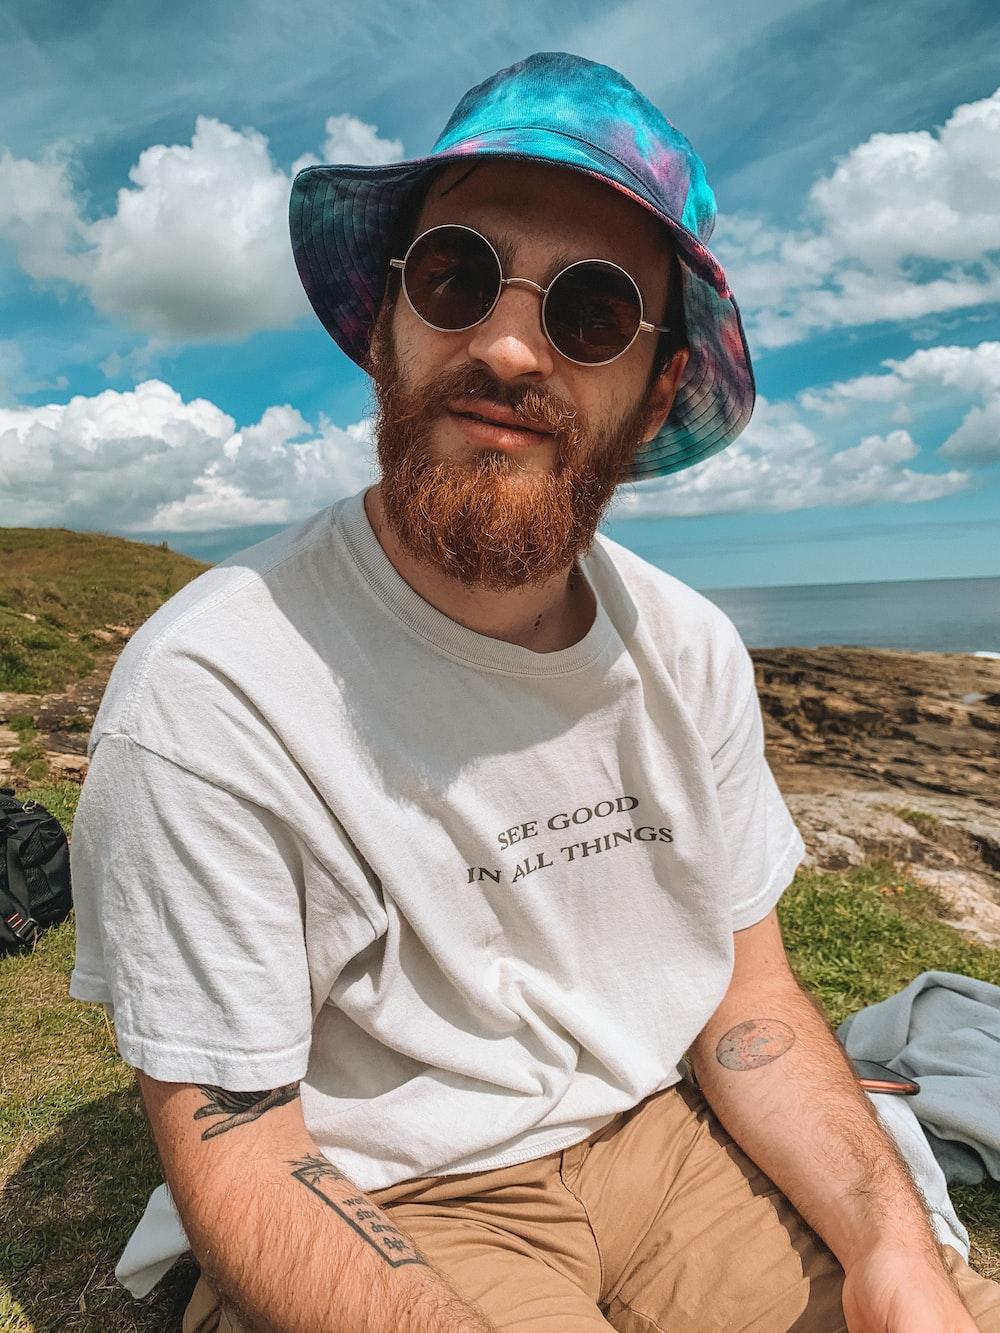 man in white crew neck t-shirt wearing blue sunglasses